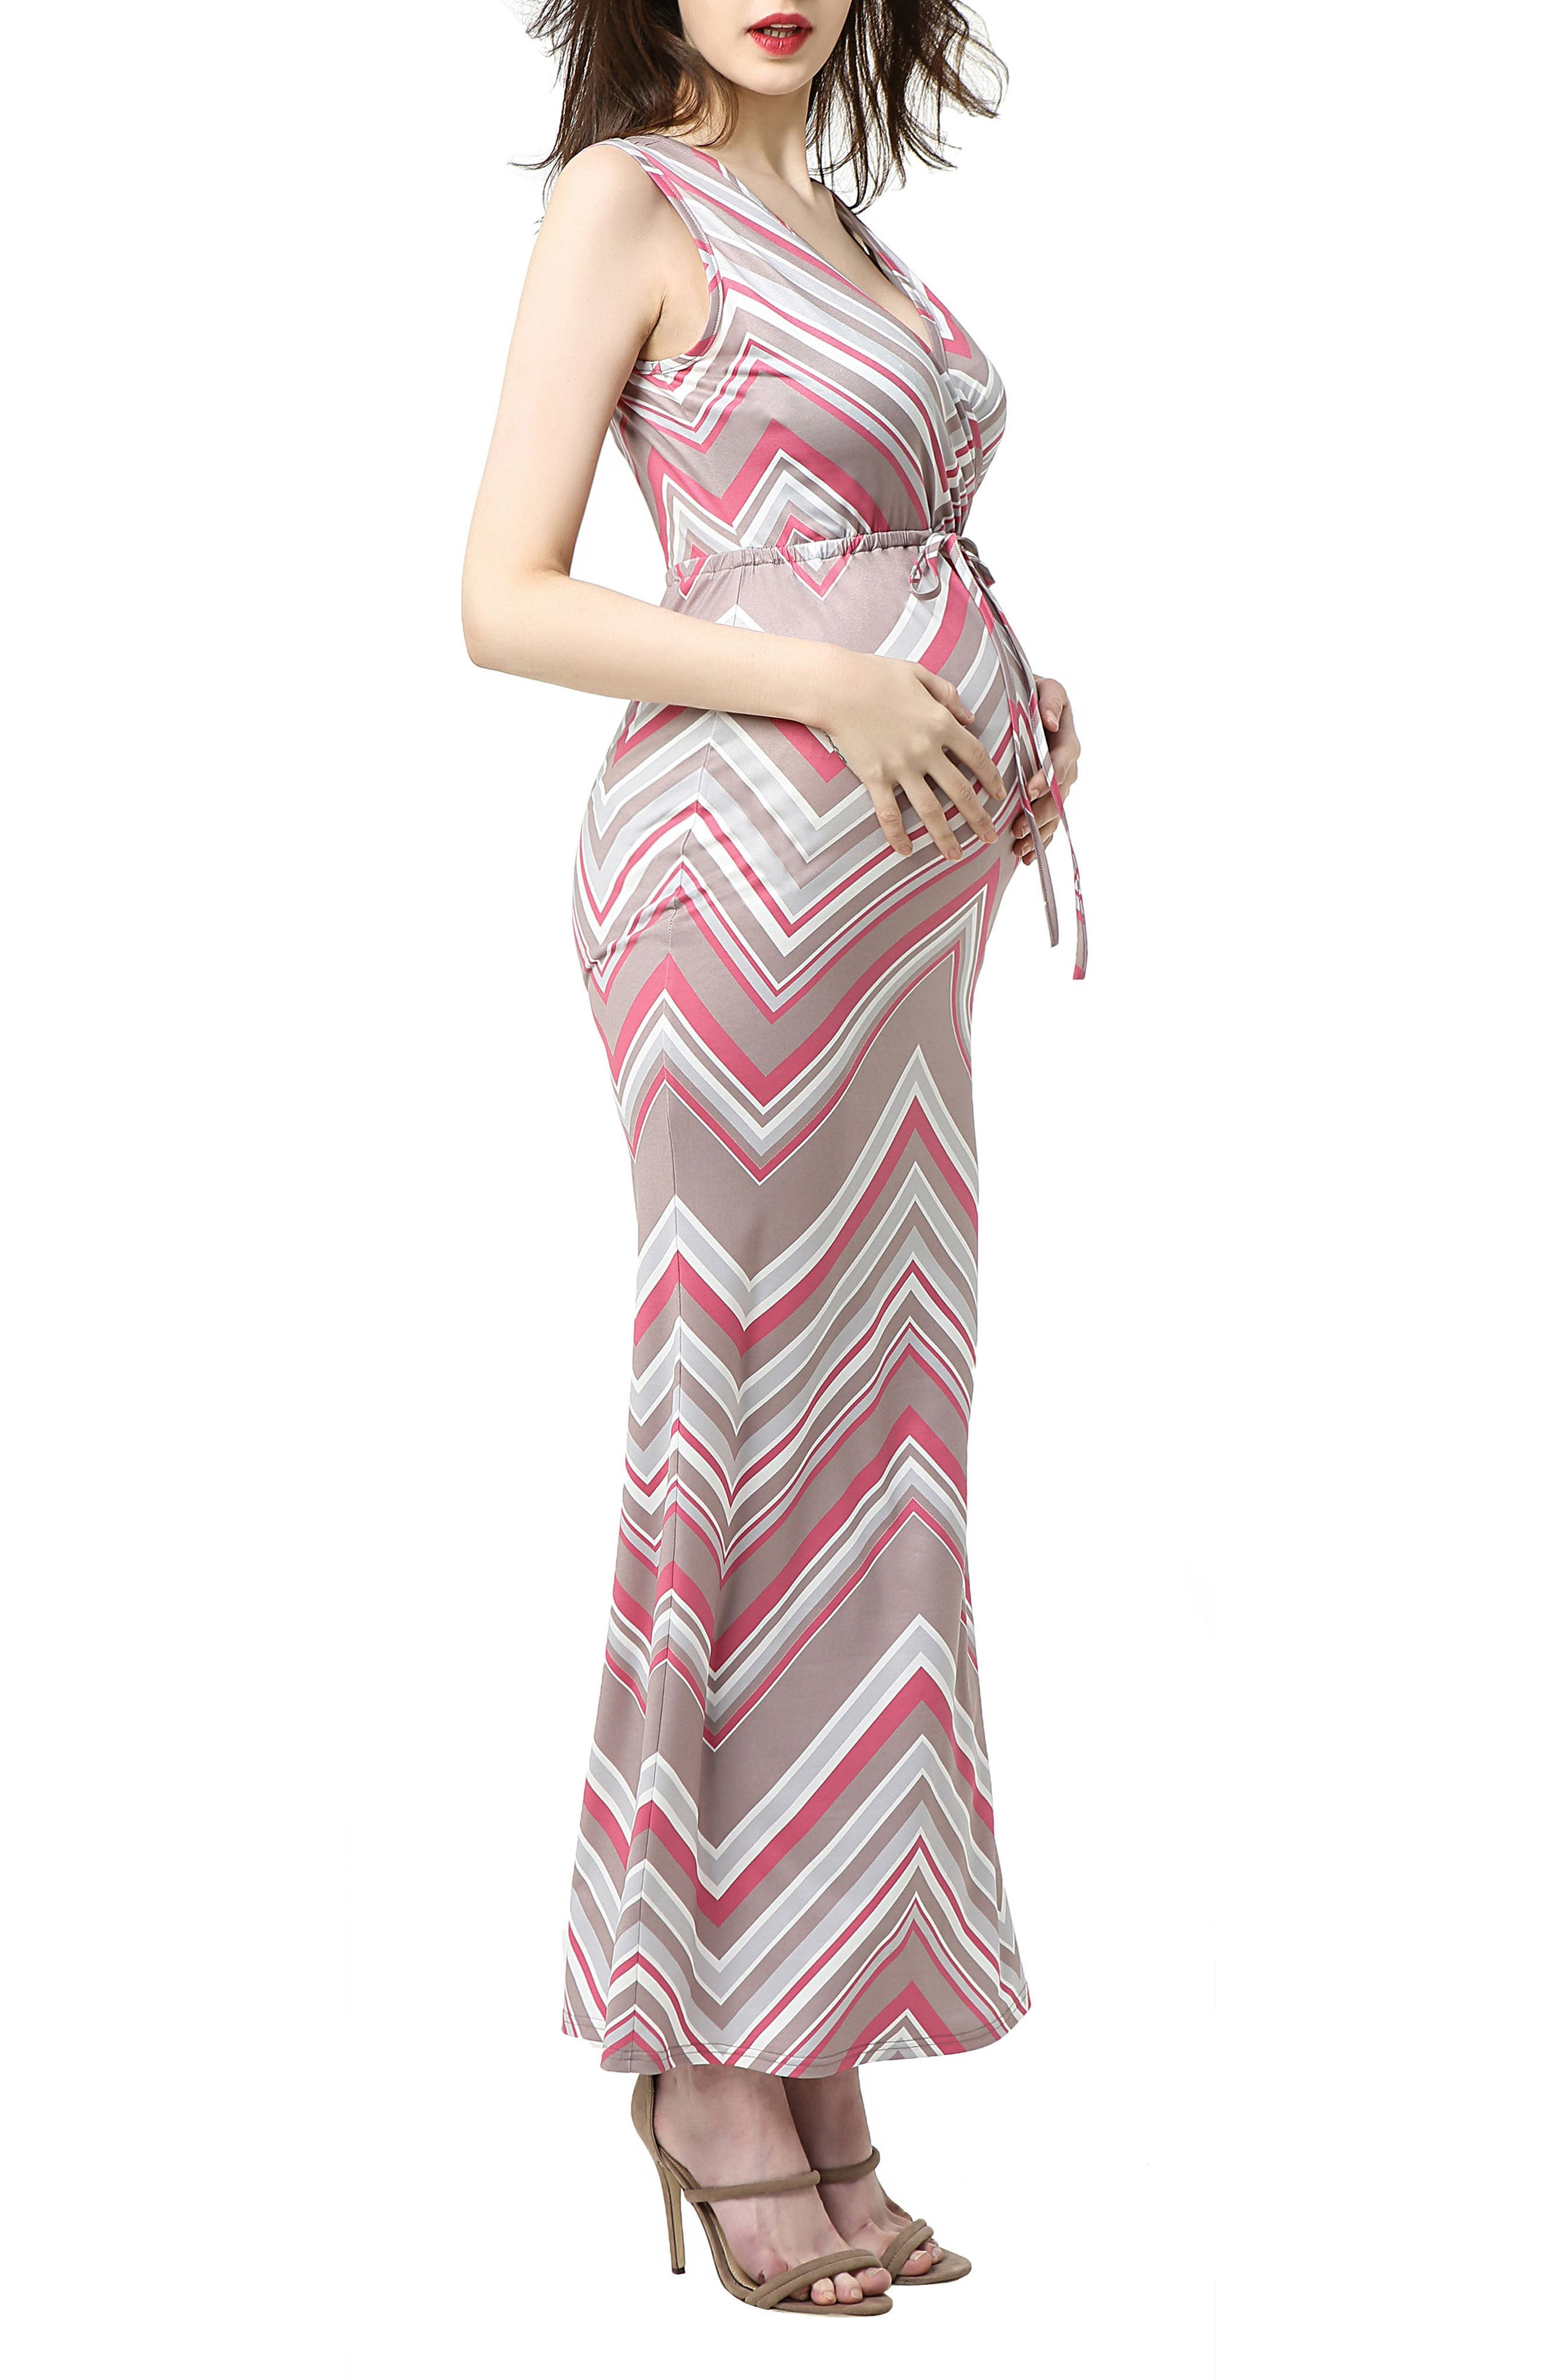 Natalie Chevron Print Maxi Maternity Dress,                             Alternate thumbnail 2, color,                             Multicolored Stripe